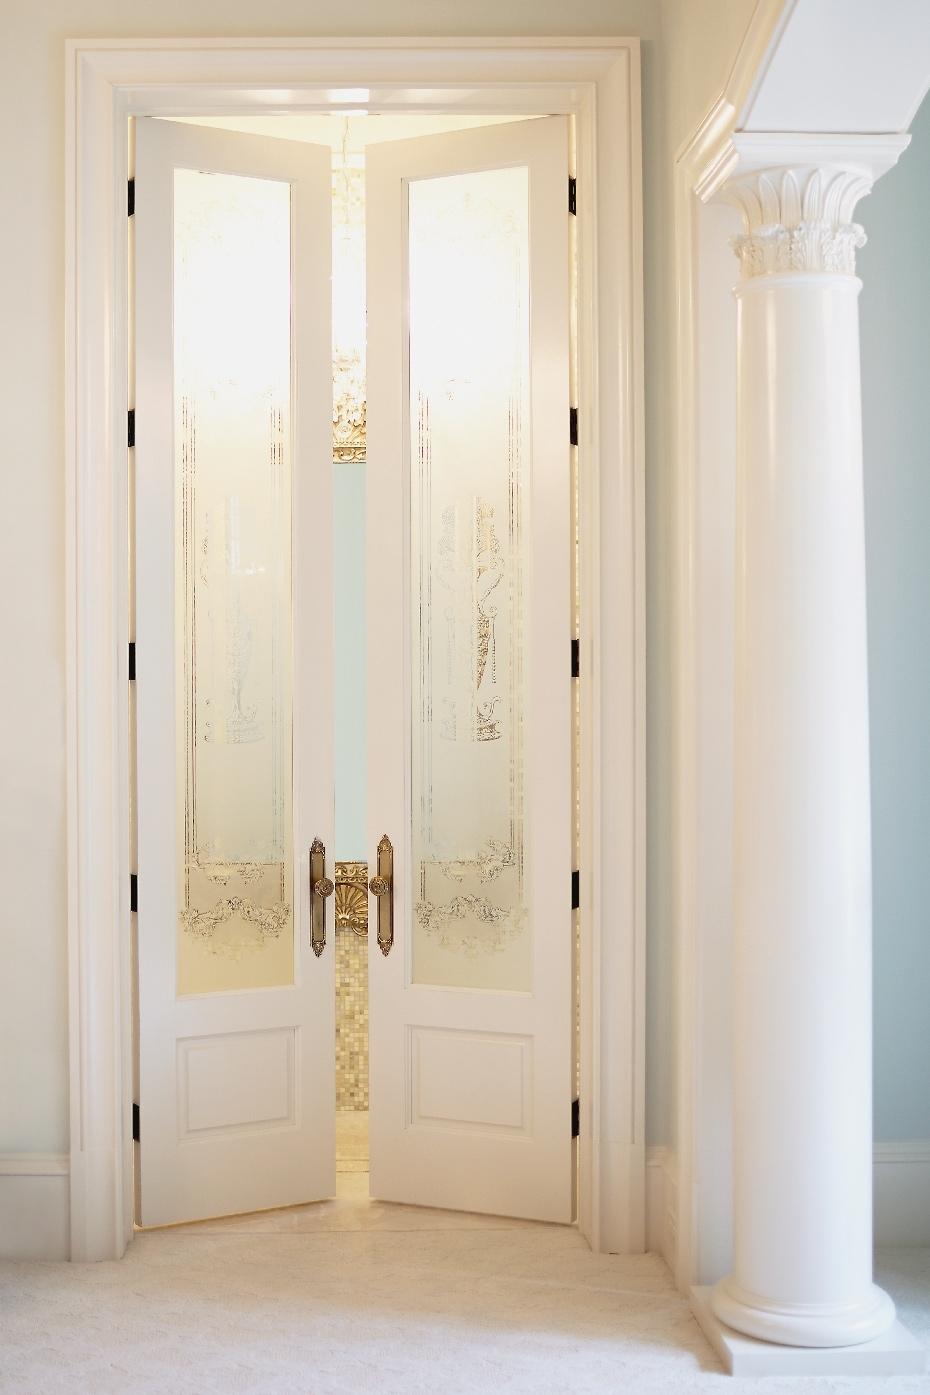 Stacey Van Berkel Photography I Tall elegant doors I Parisian apartment I Bernhardt Furniture